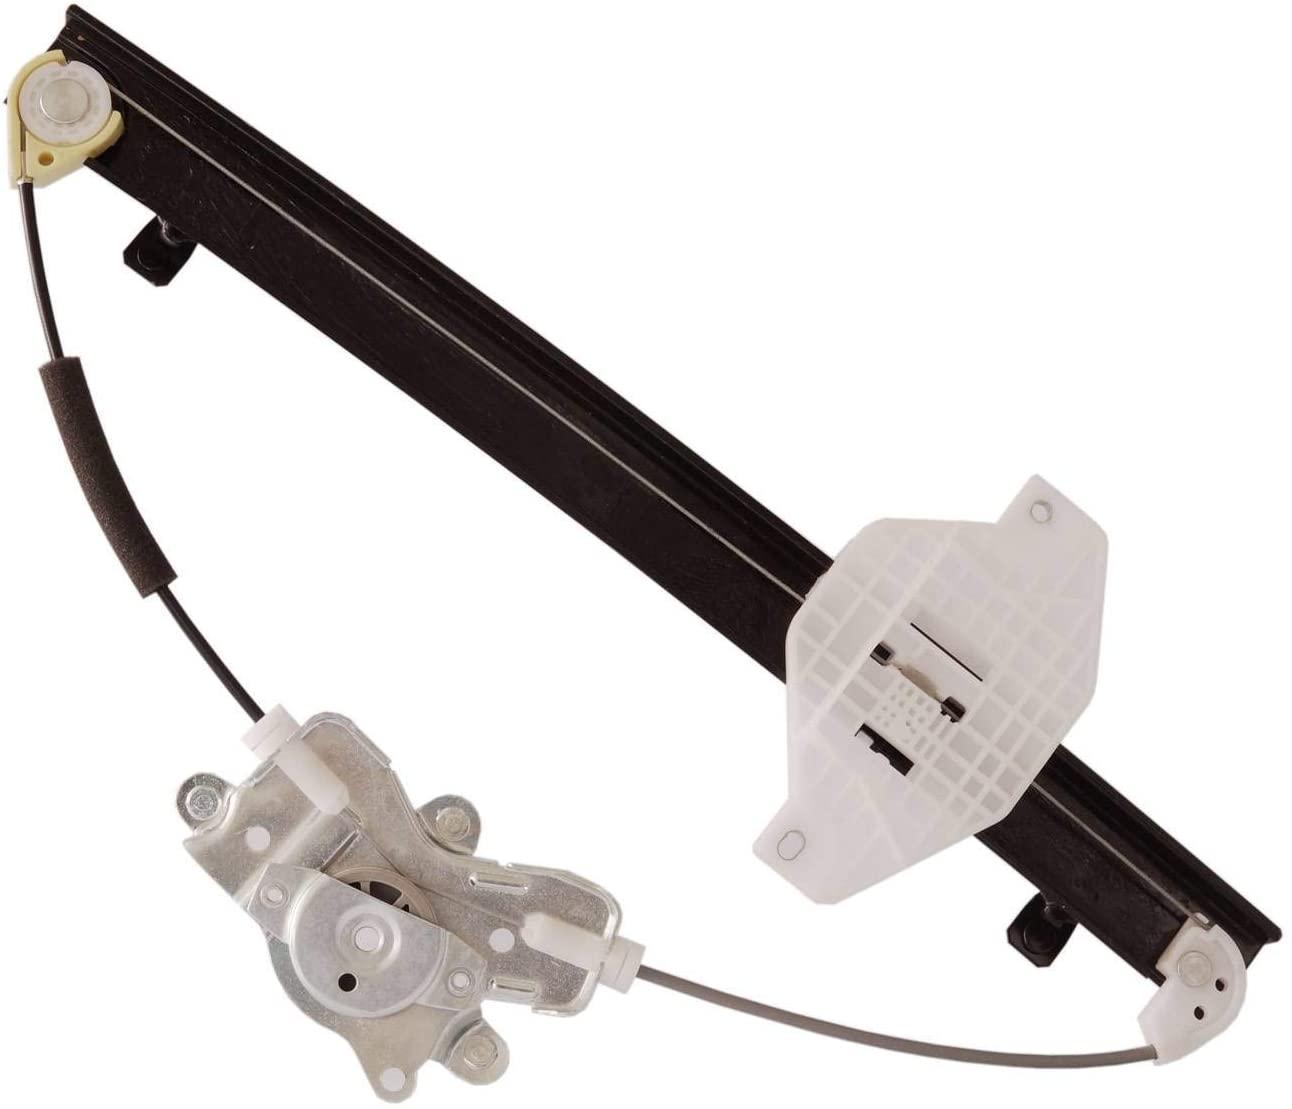 DB 1pc Power Window Lifter Regulator Rear Driver Left Compatible with 99-05 Sonata 01-05 Optima